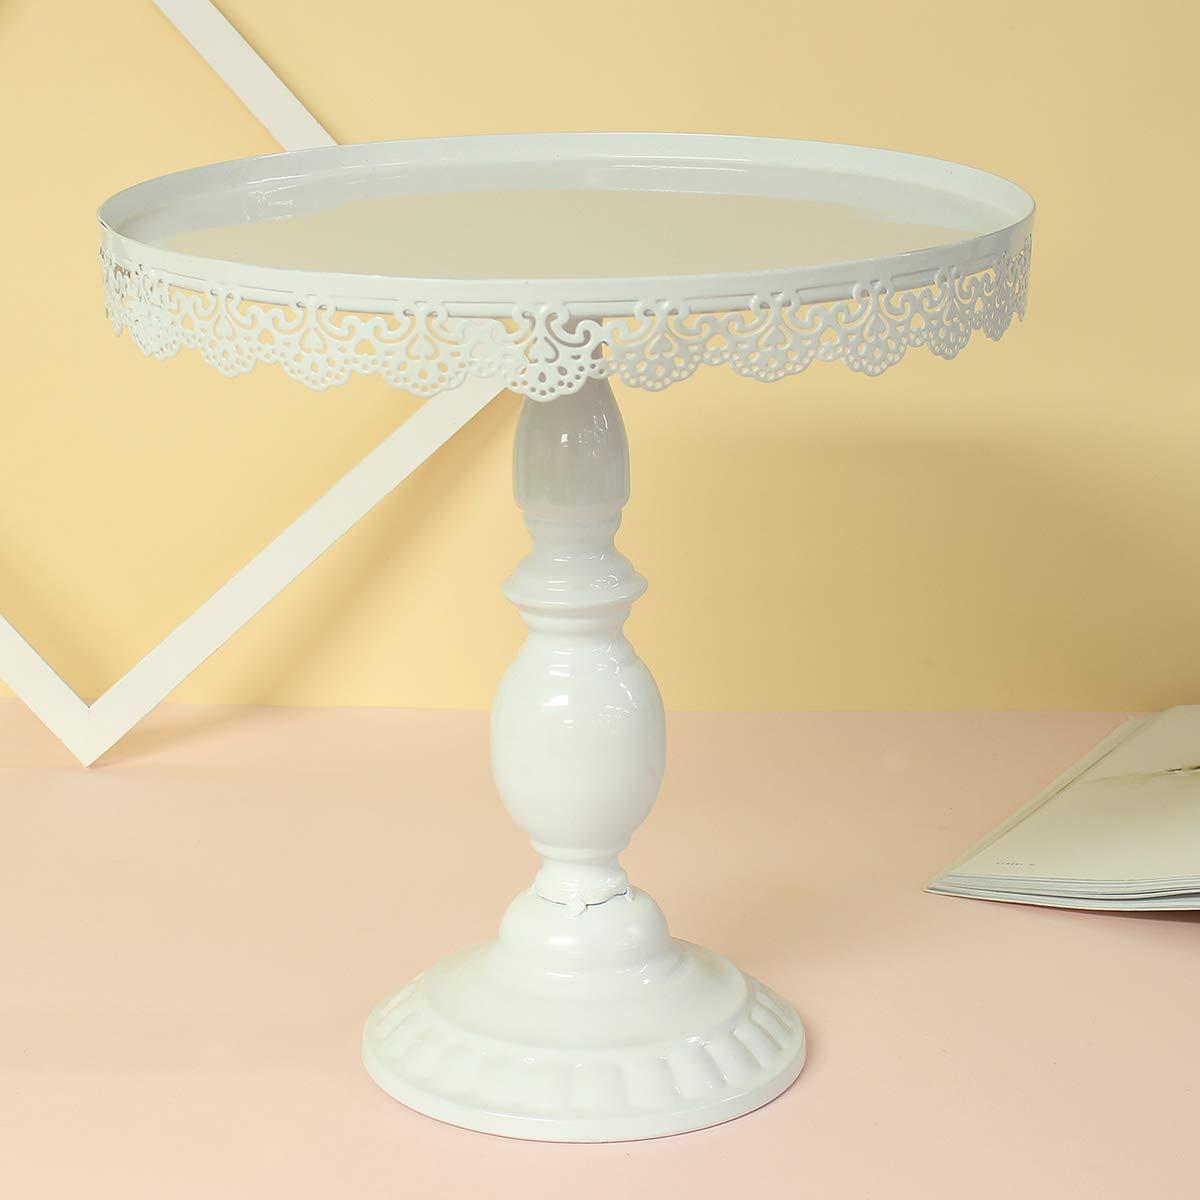 color blanco Soporte para tartas redondo para postres 30 unidades sorliva